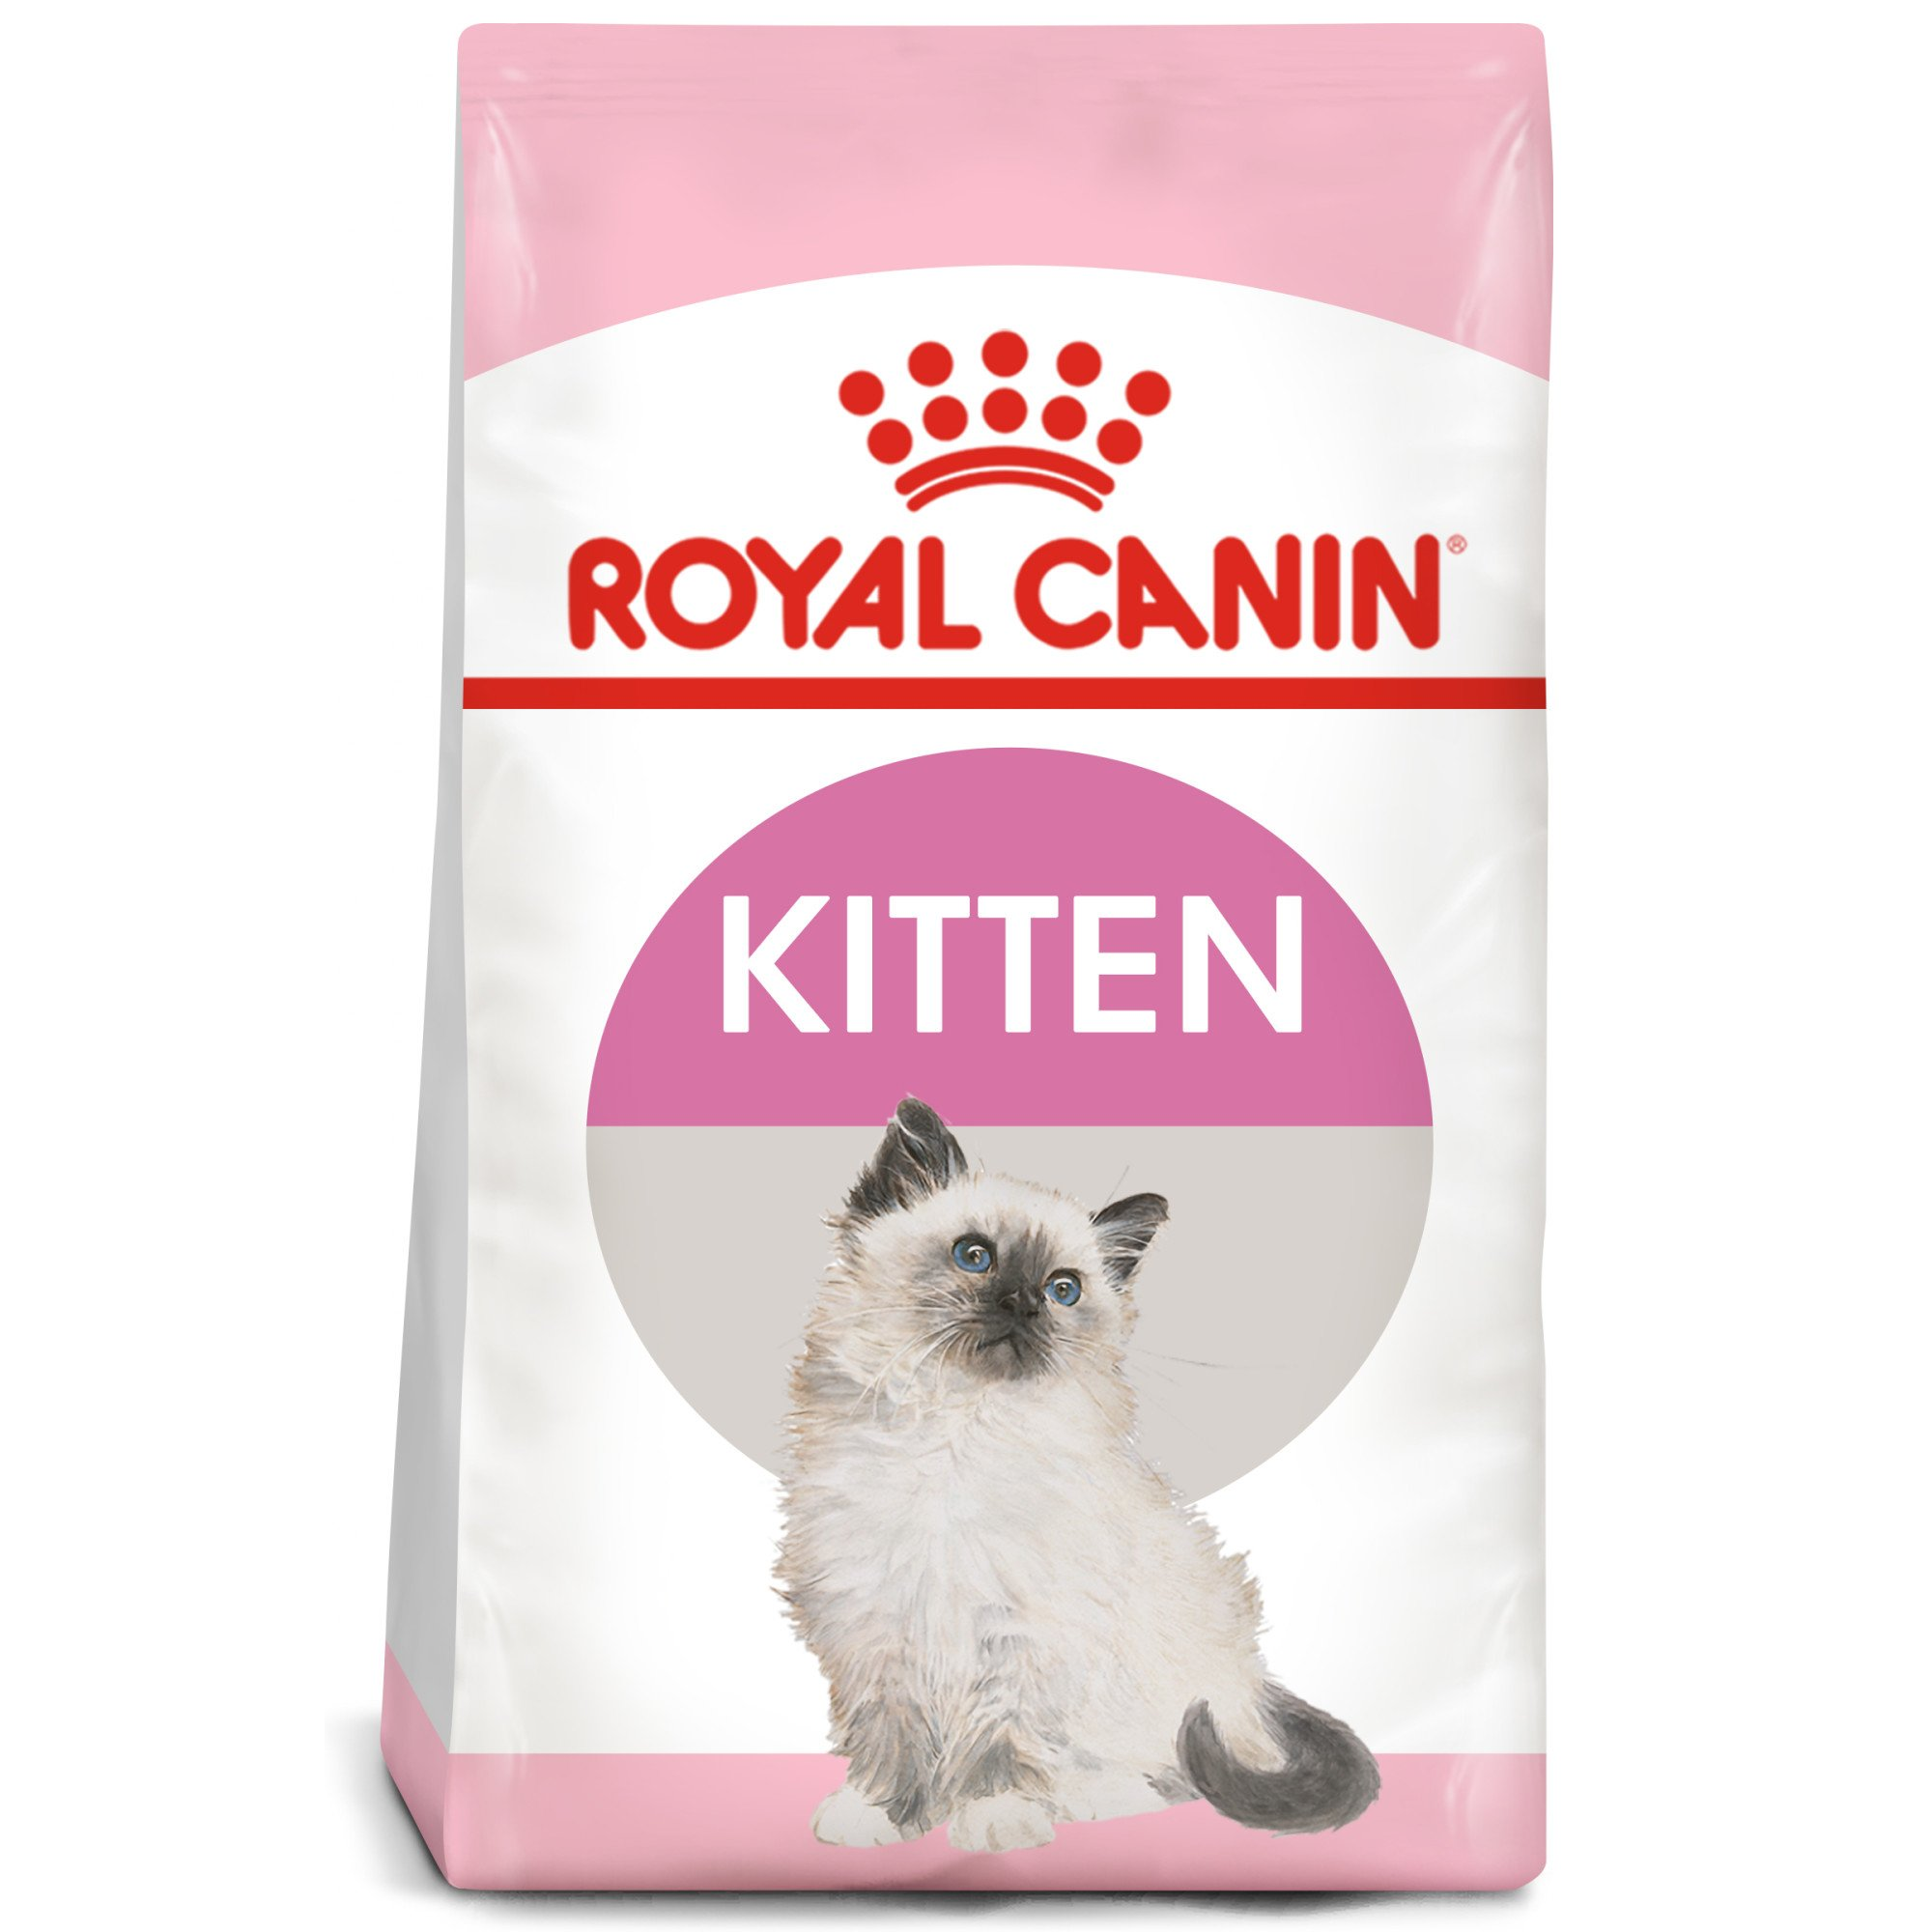 Royal Canin Feline Health Nutrition Dry Kitten Food | Petco